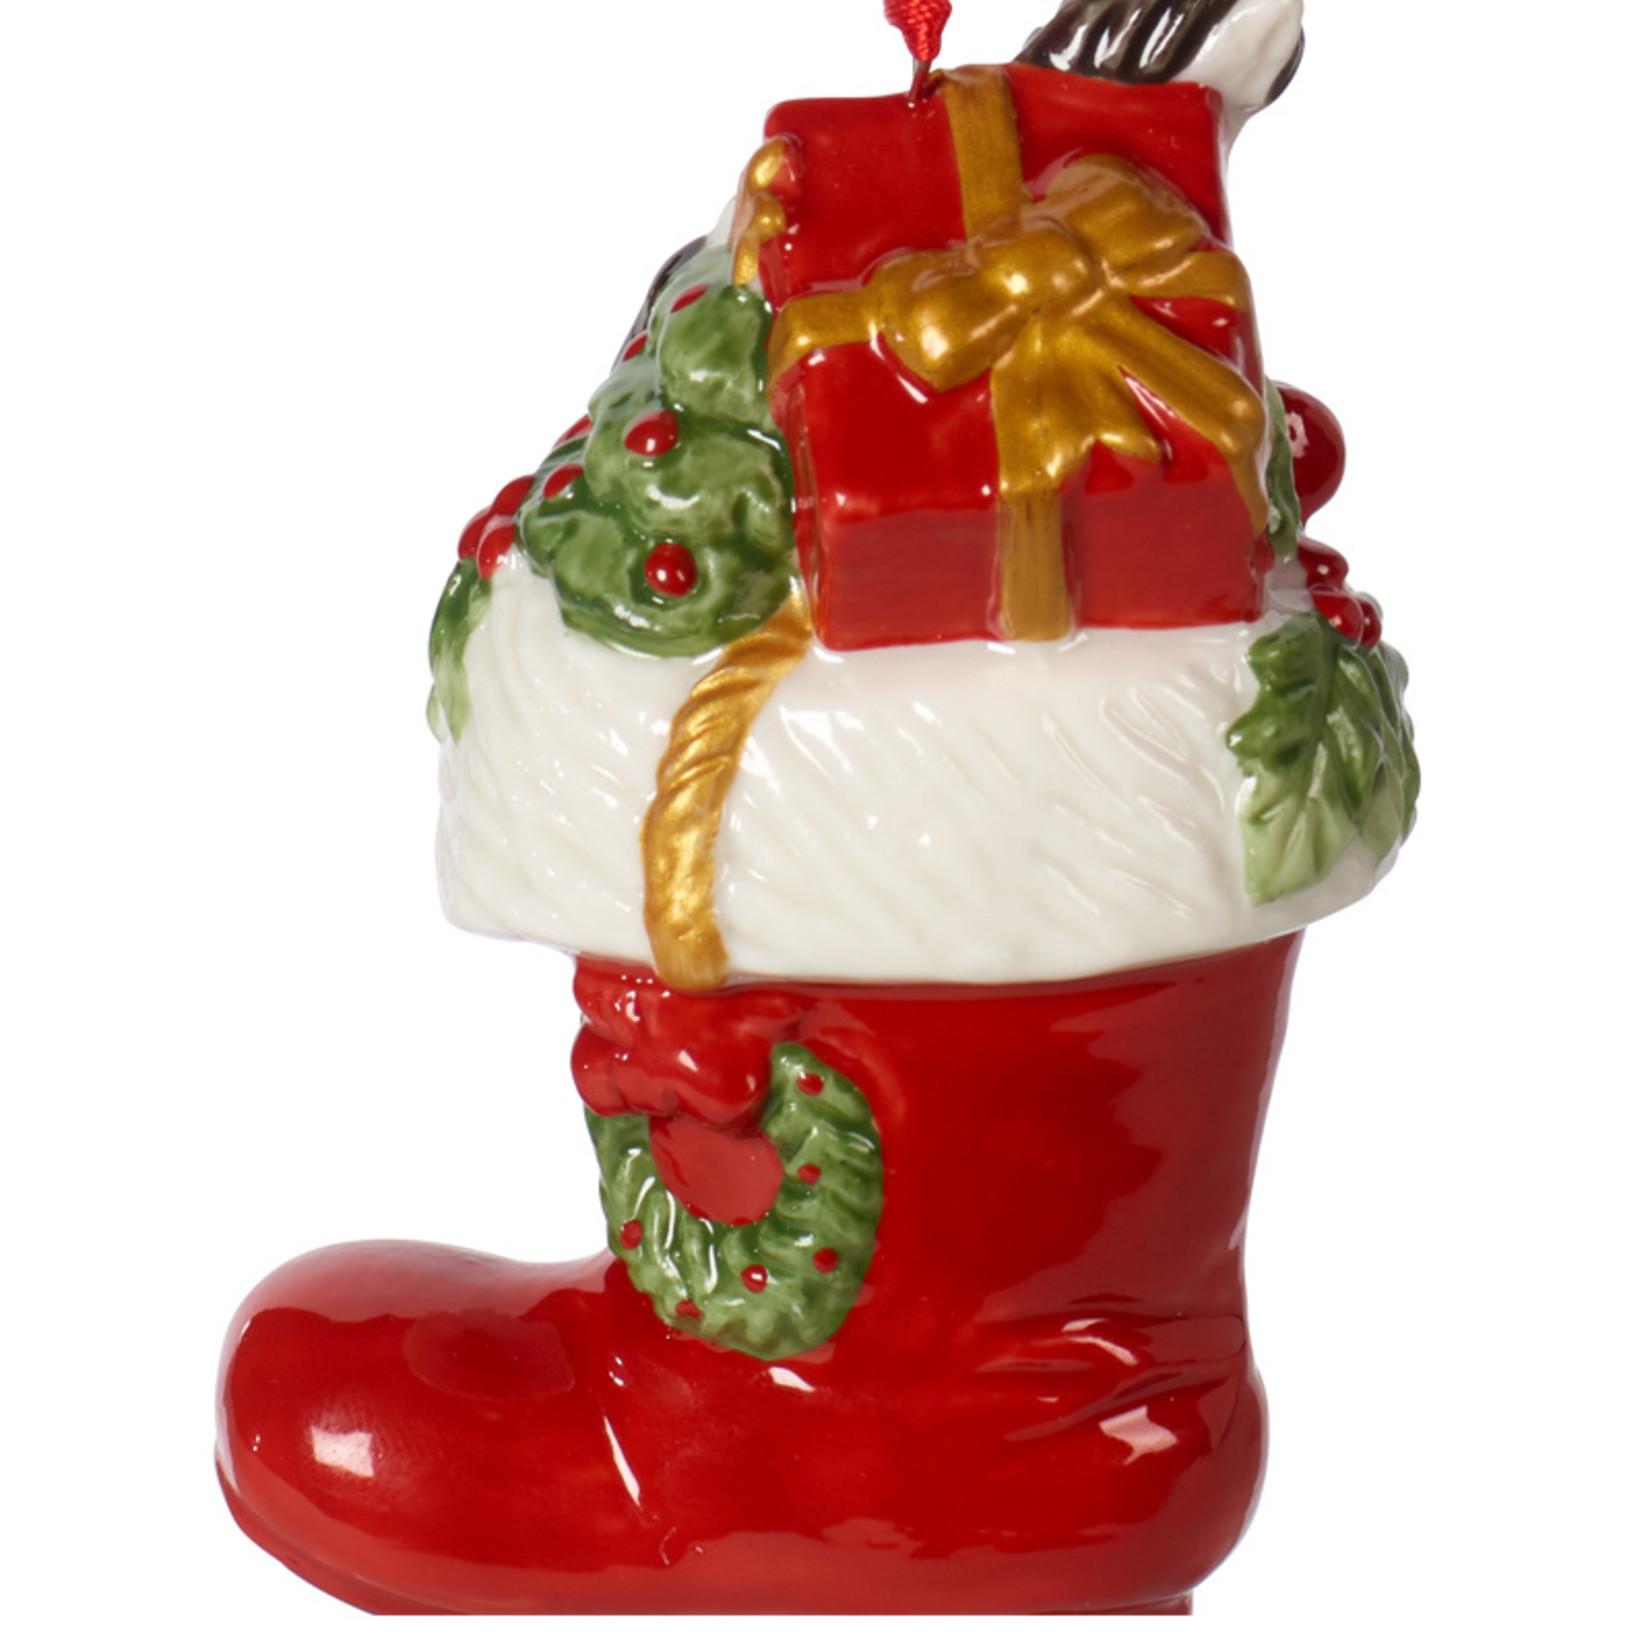 Villeroy & Boch  Hänger Set Geschenke | Villeroy & Boch Nostalgic Ornaments